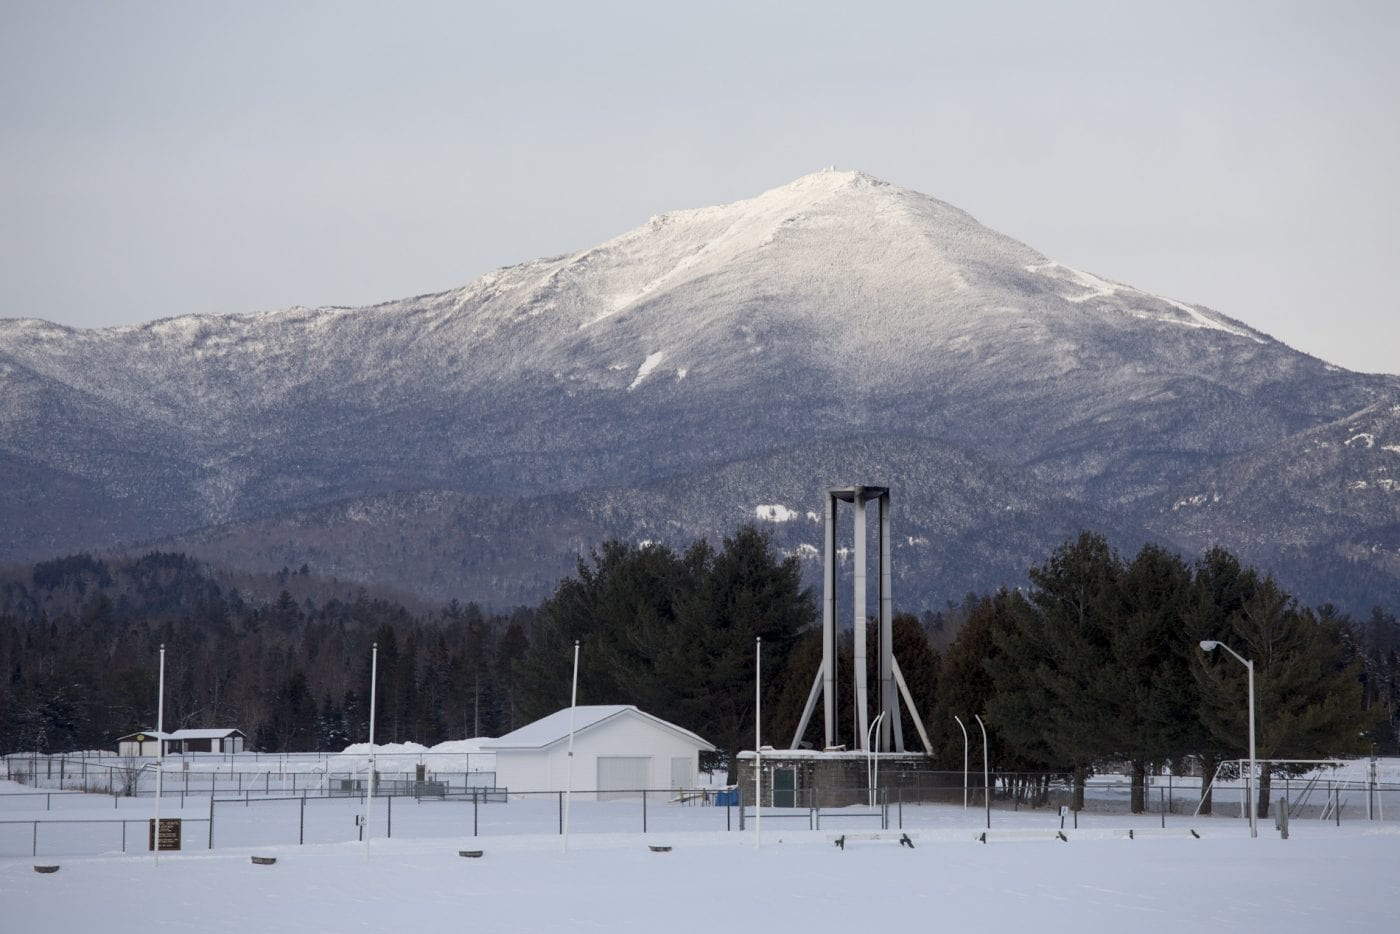 Snowy Peaks Adirondacks-Mike-Lynch-13